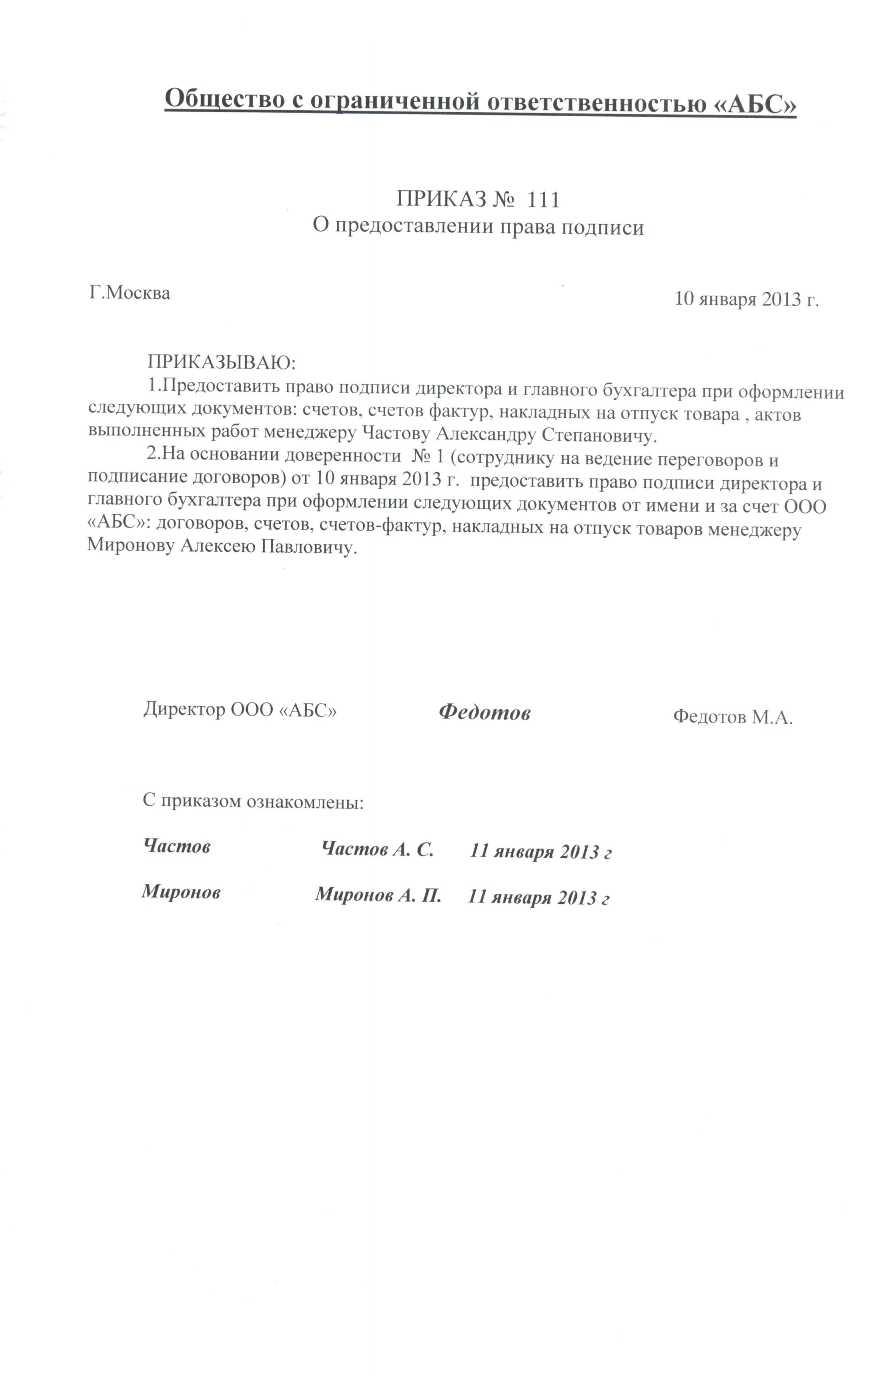 документ образец